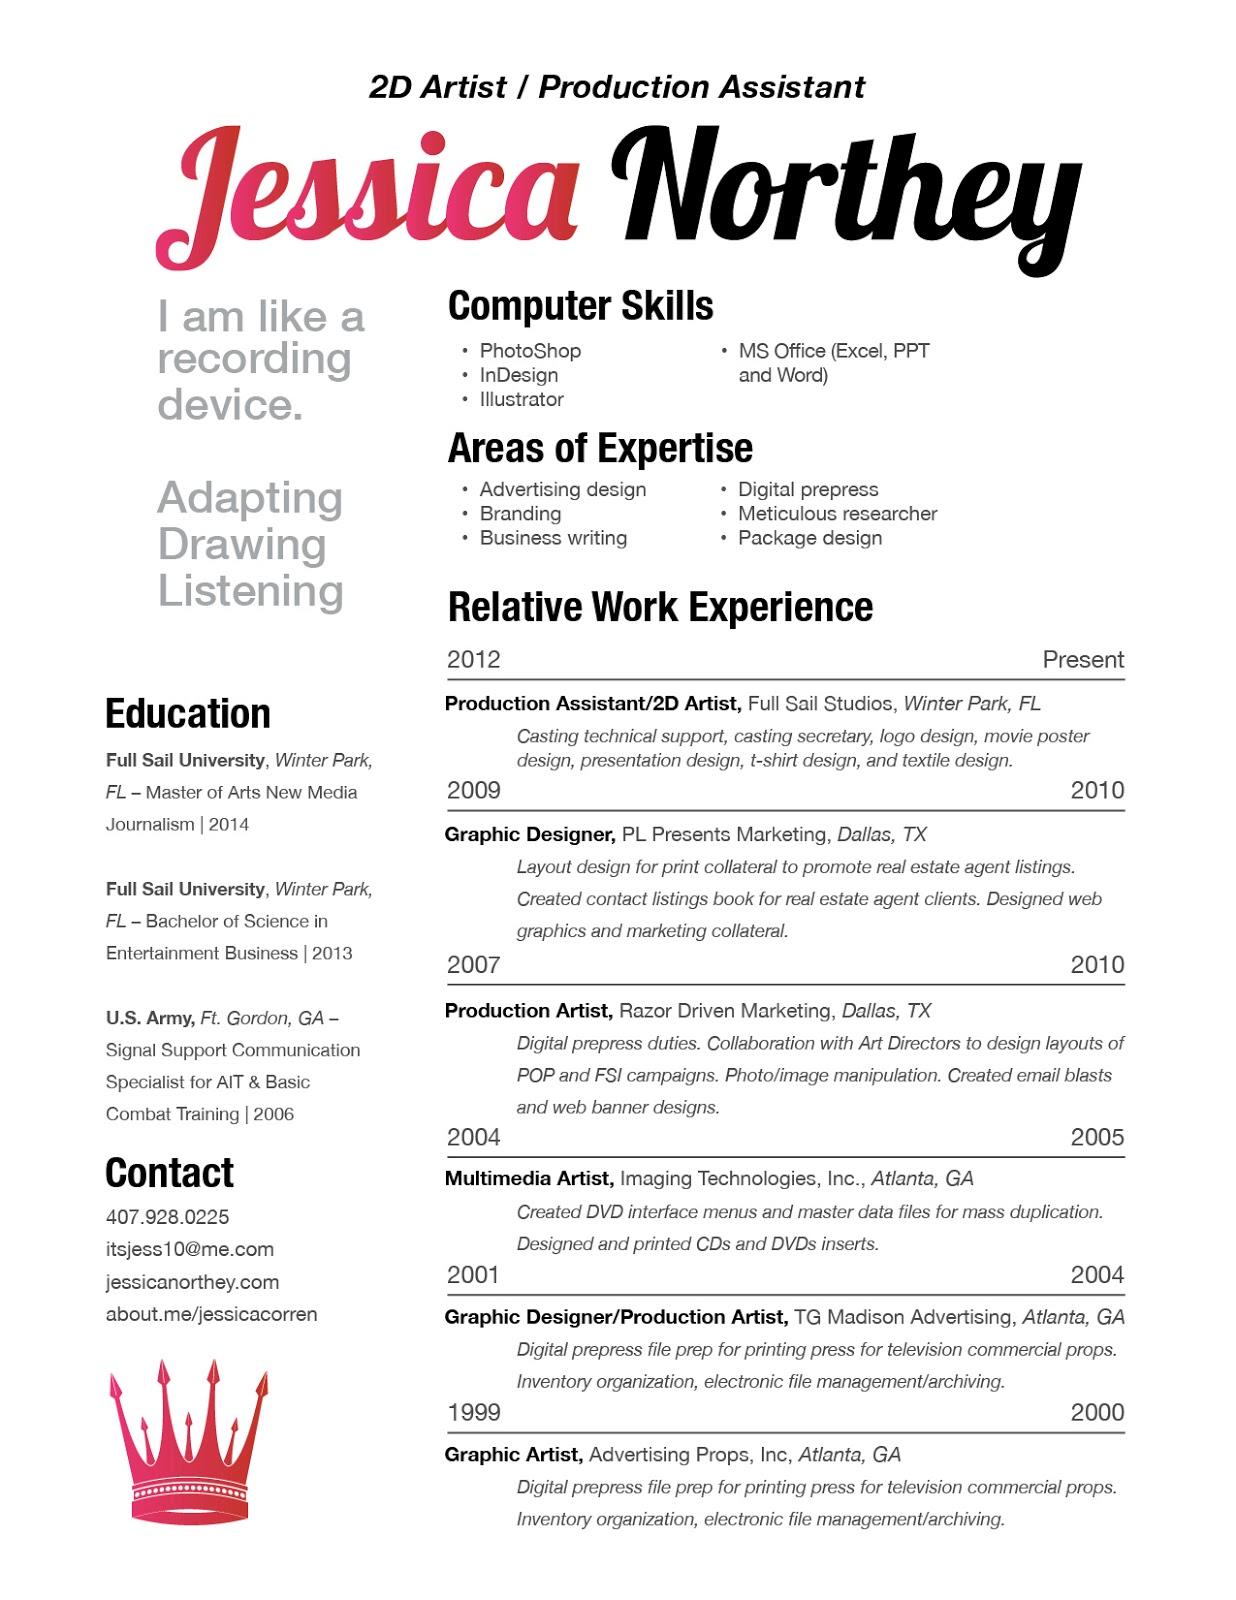 resume help construction worker entry level resume builder breakupus marvelous entrylevel resume help for construction workers pay for essays construction